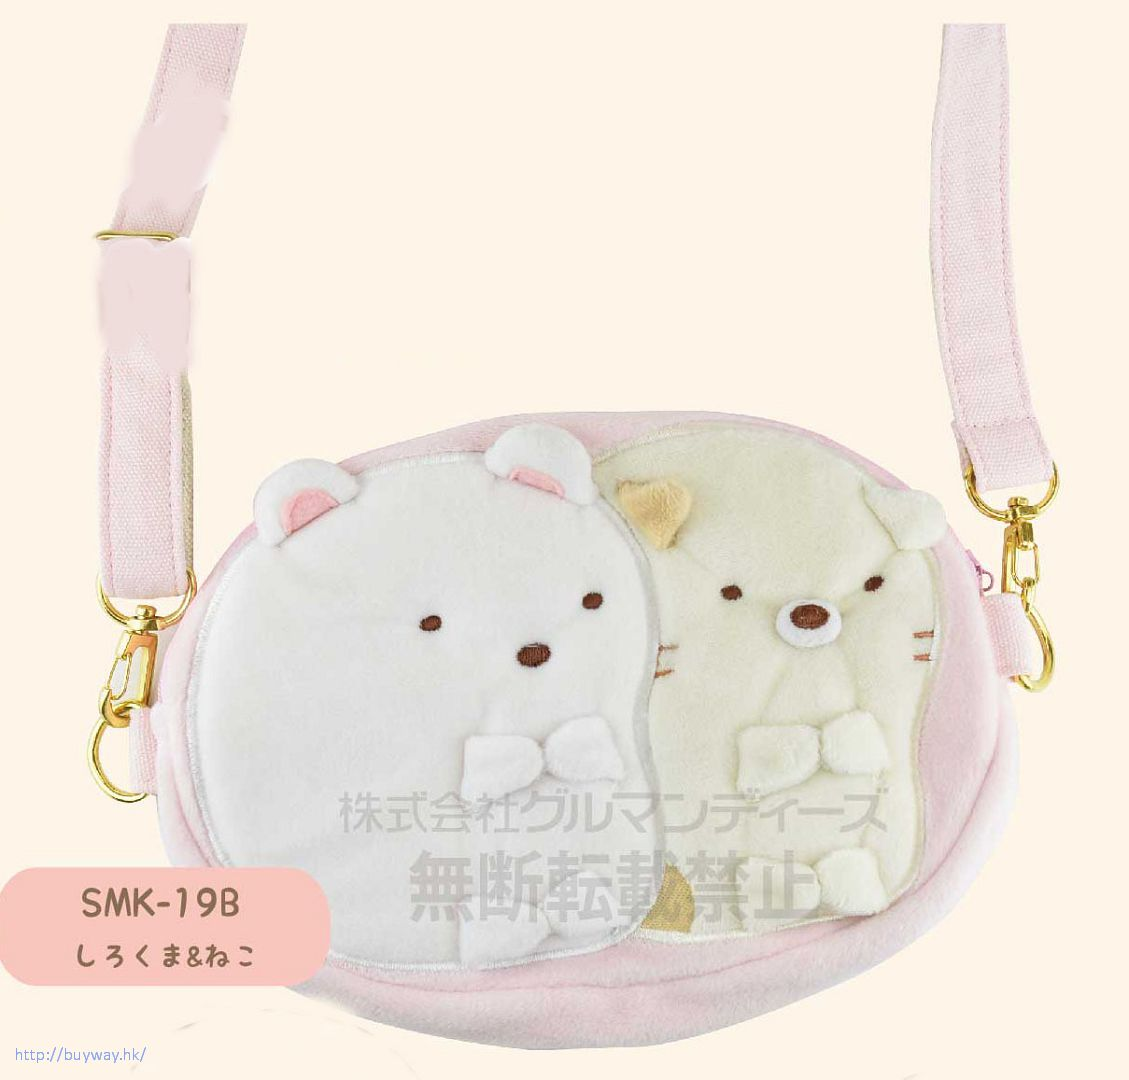 角落生物 「白熊 + 貓咪」手機袋 Smartphone Bag Shirokuma & Neko SMK-19B【Sumikko Gurashi】